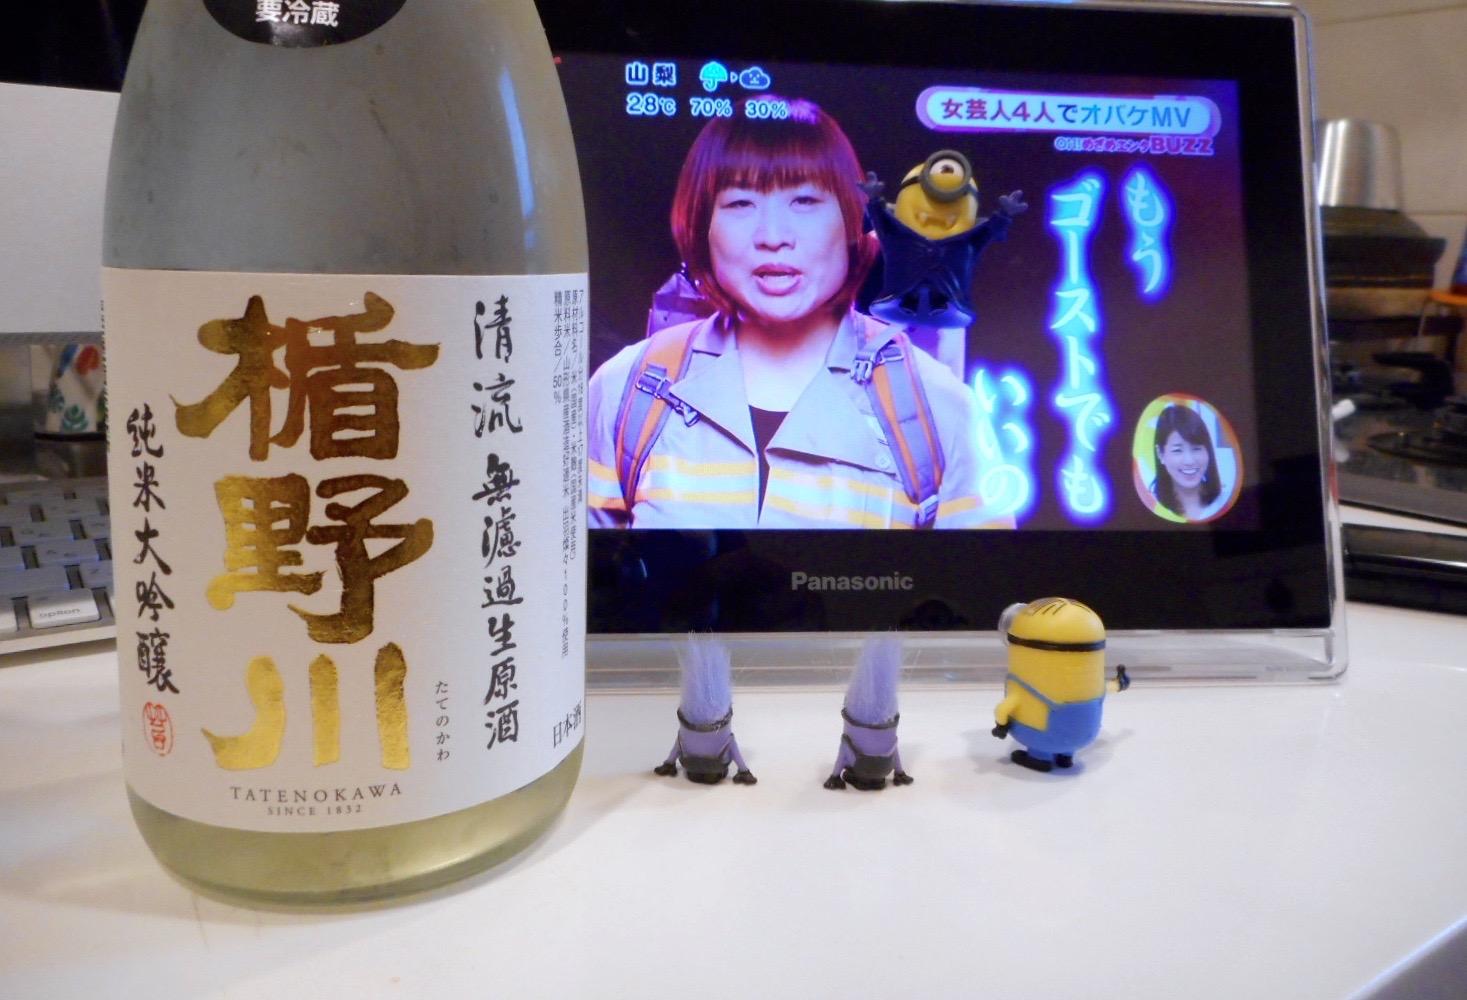 tatenokawa_seiryu_nama1.jpg